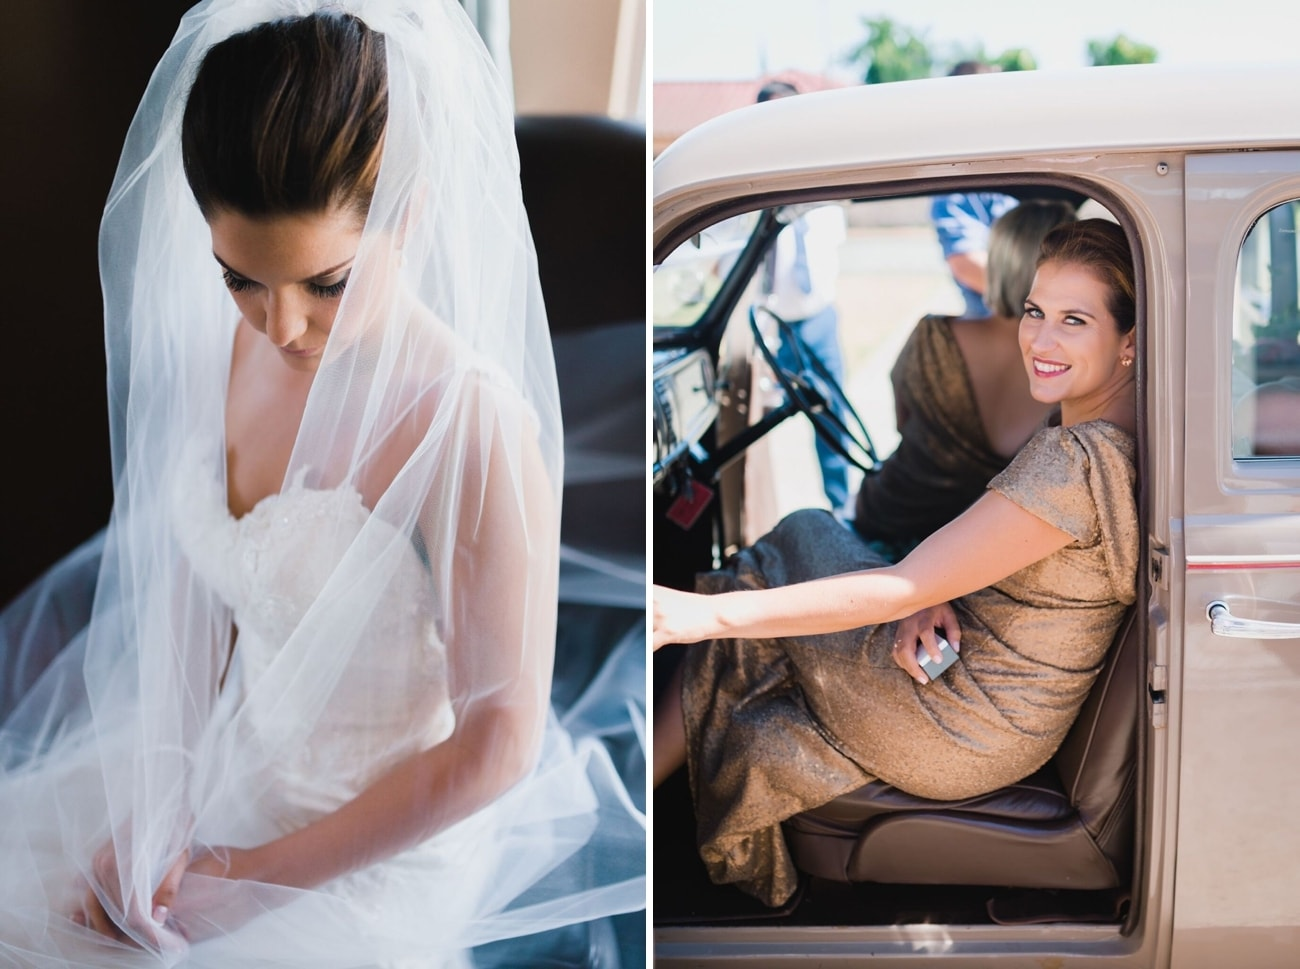 Bride in classic veil | Credit: Matthew Carr